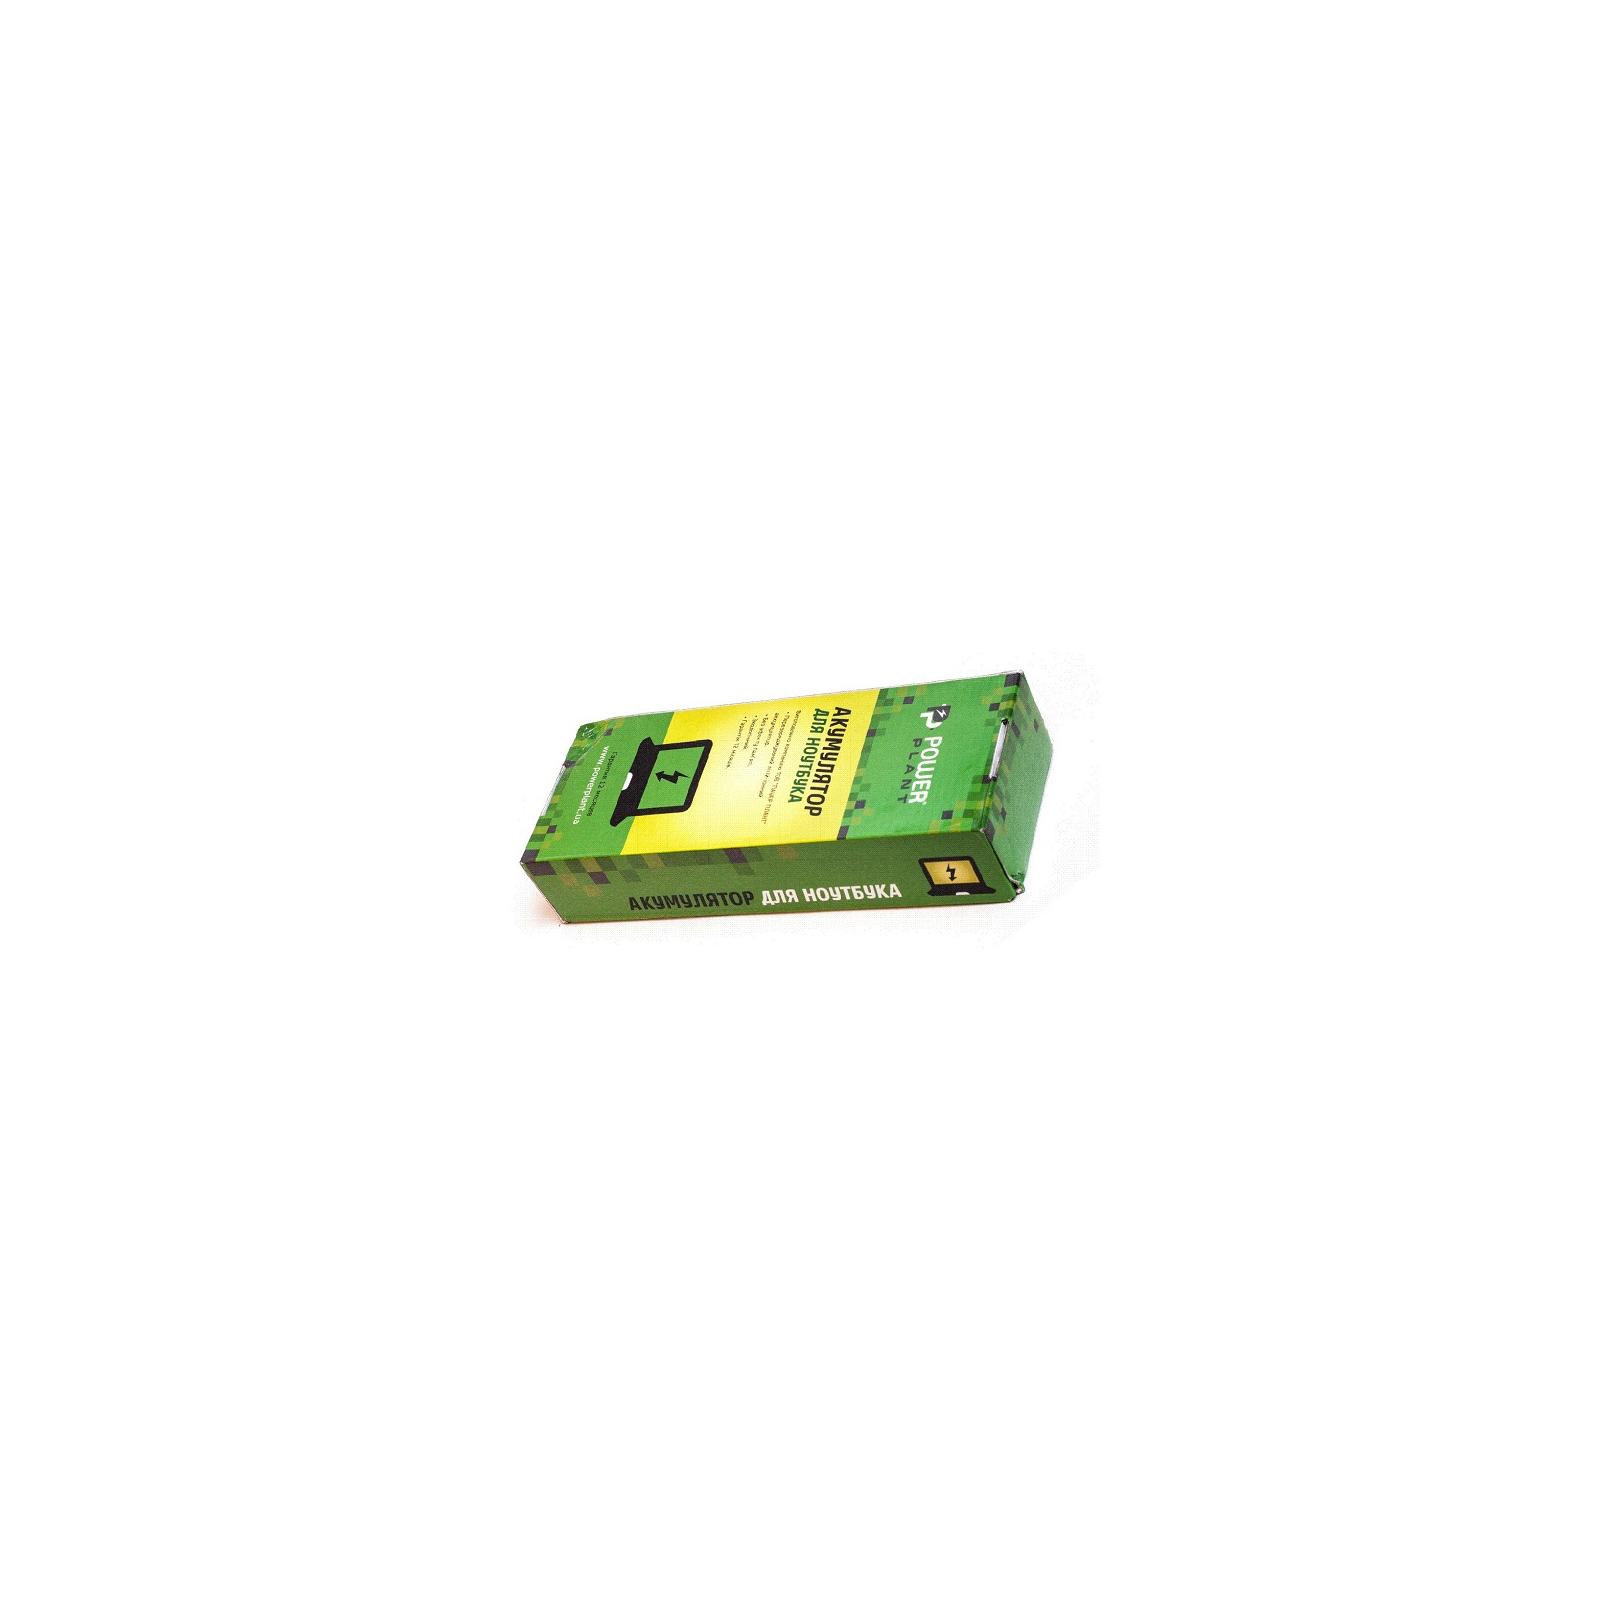 Аккумулятор для ноутбука SAMSUNG M60 (AA-PB2NC3B, SG6560LH) 11.1V 5200mAh PowerPlant (NB00000151) изображение 3